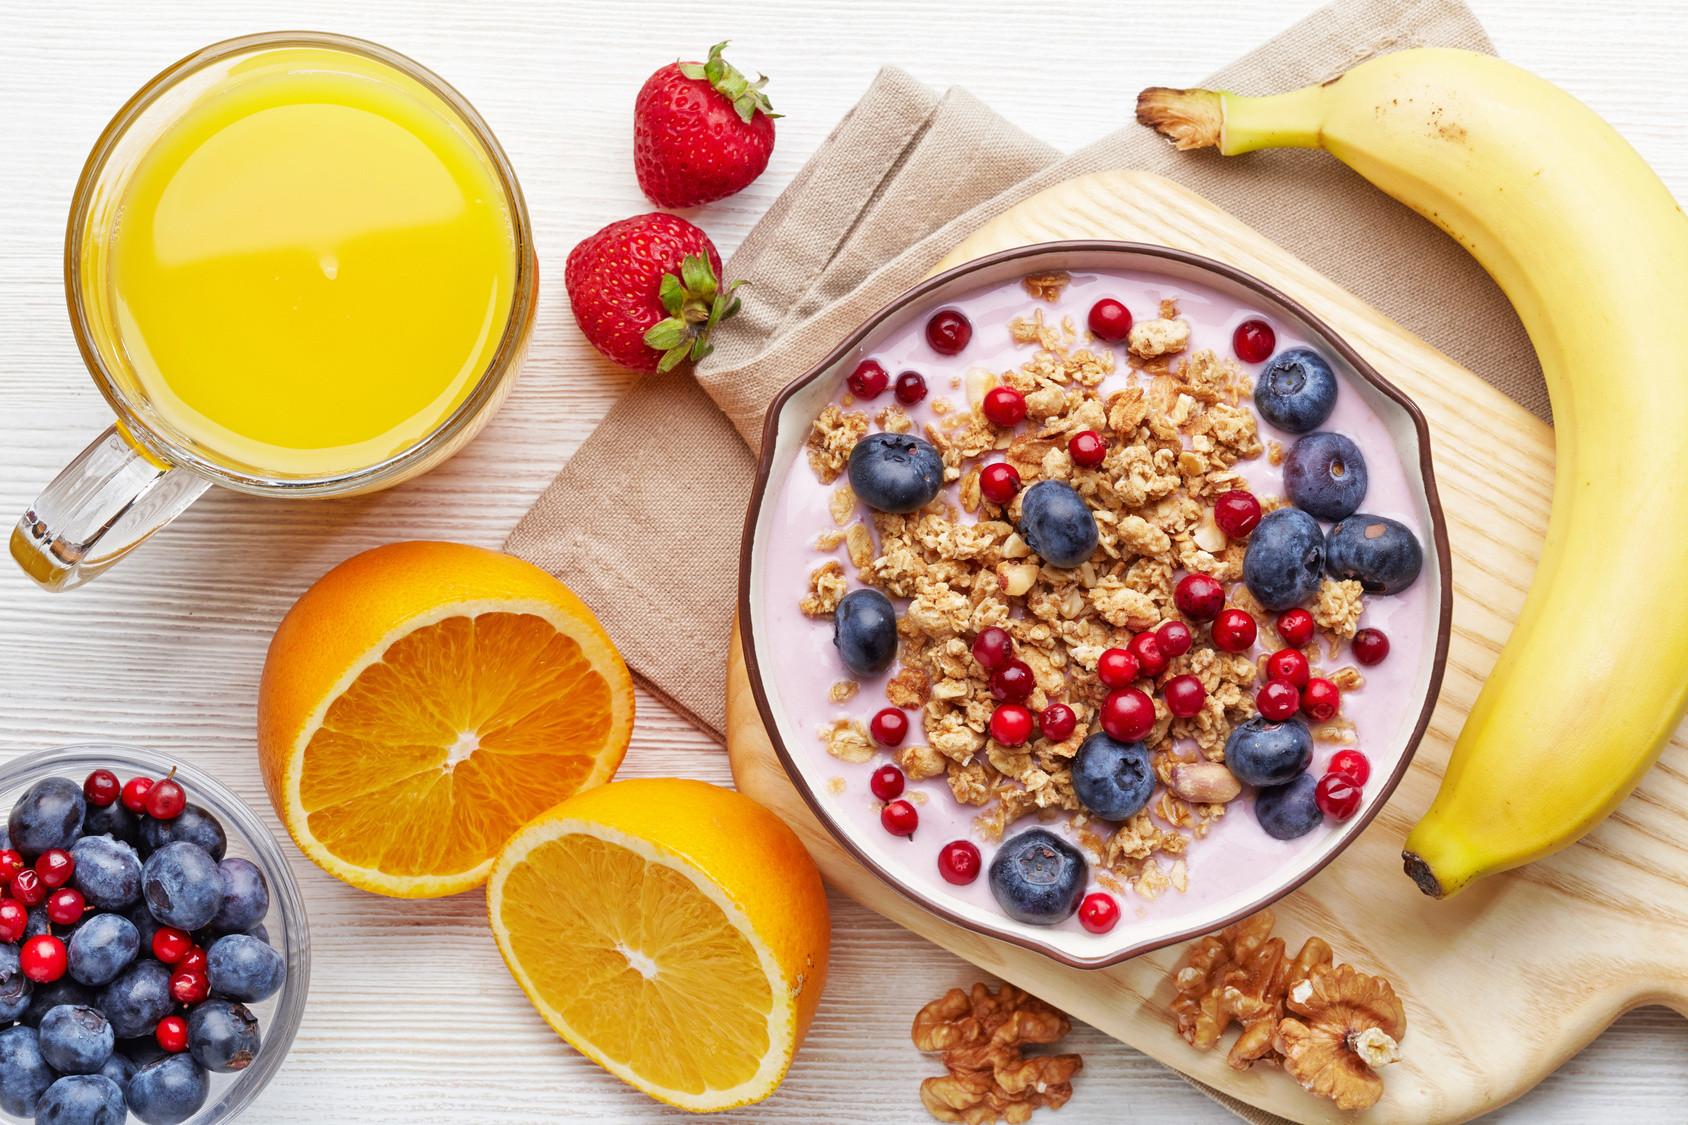 Healthy Nutritious Breakfast  Easy And Healthy Breakfast Ideas